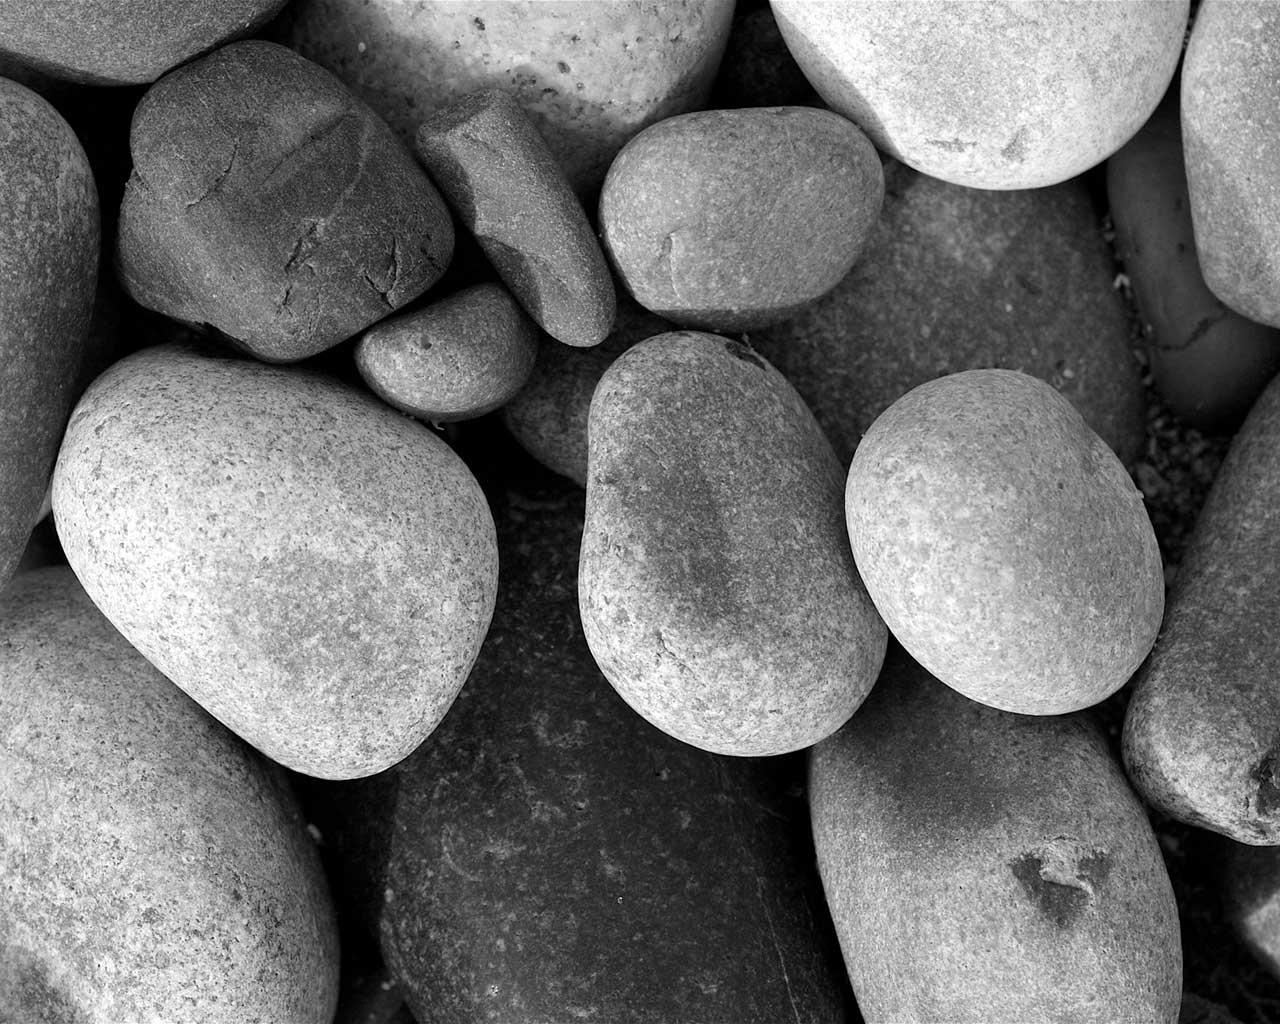 http://3.bp.blogspot.com/-b_jExvZ5KpE/T8A0kxCt79I/AAAAAAAAAZU/q9YJYBRIgaw/s1600/pebbles-black-white.jpg